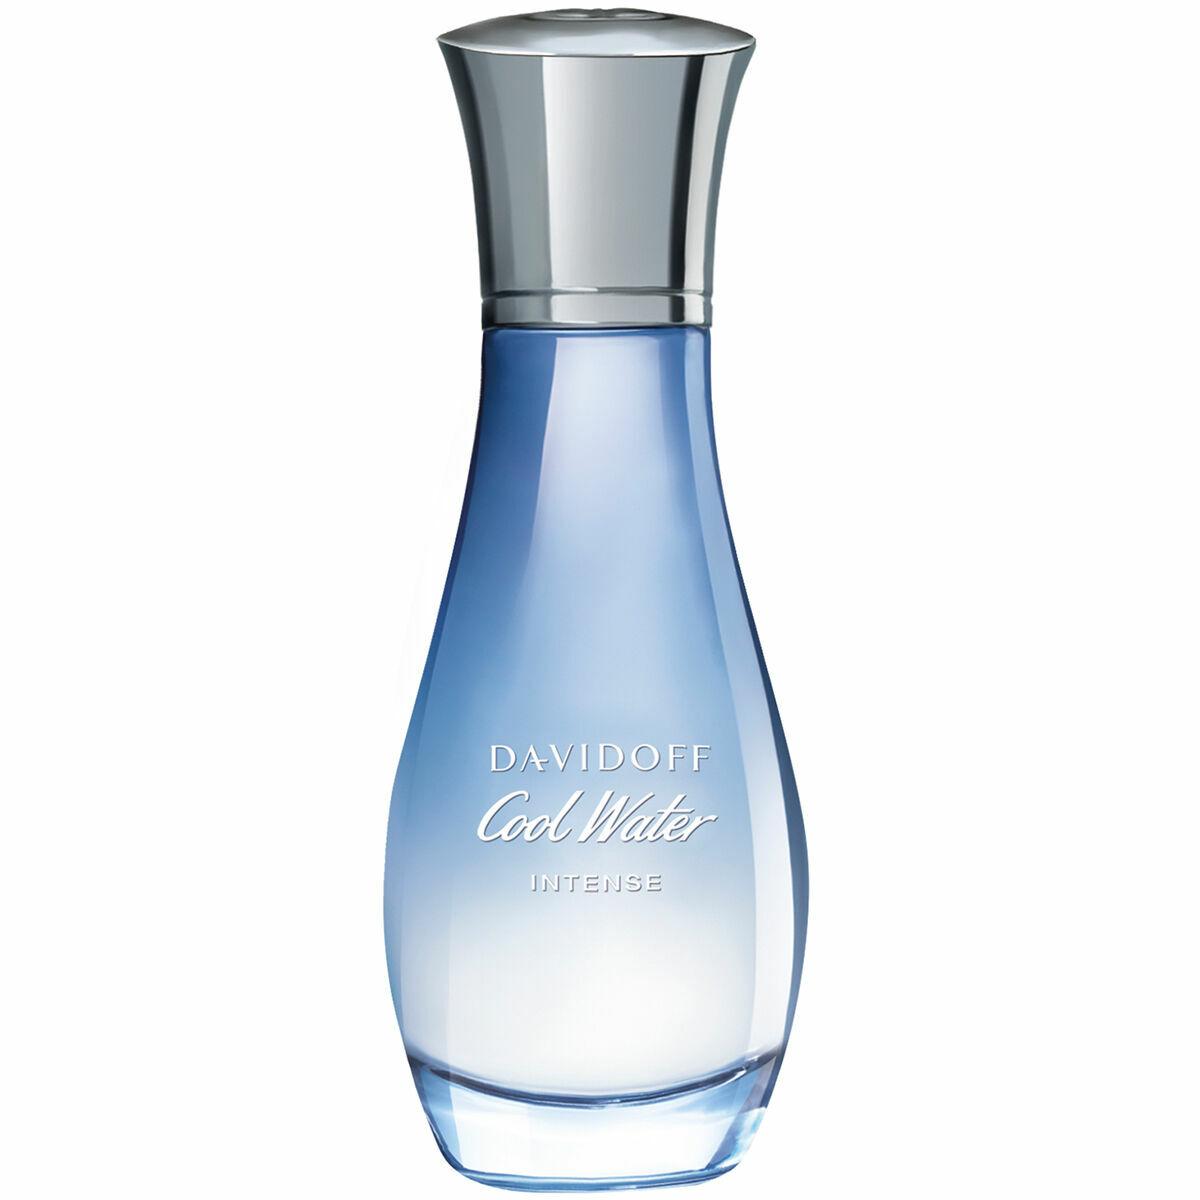 Bild 1 von Davidoff Cool Water Intense for Her, Eau de Parfum